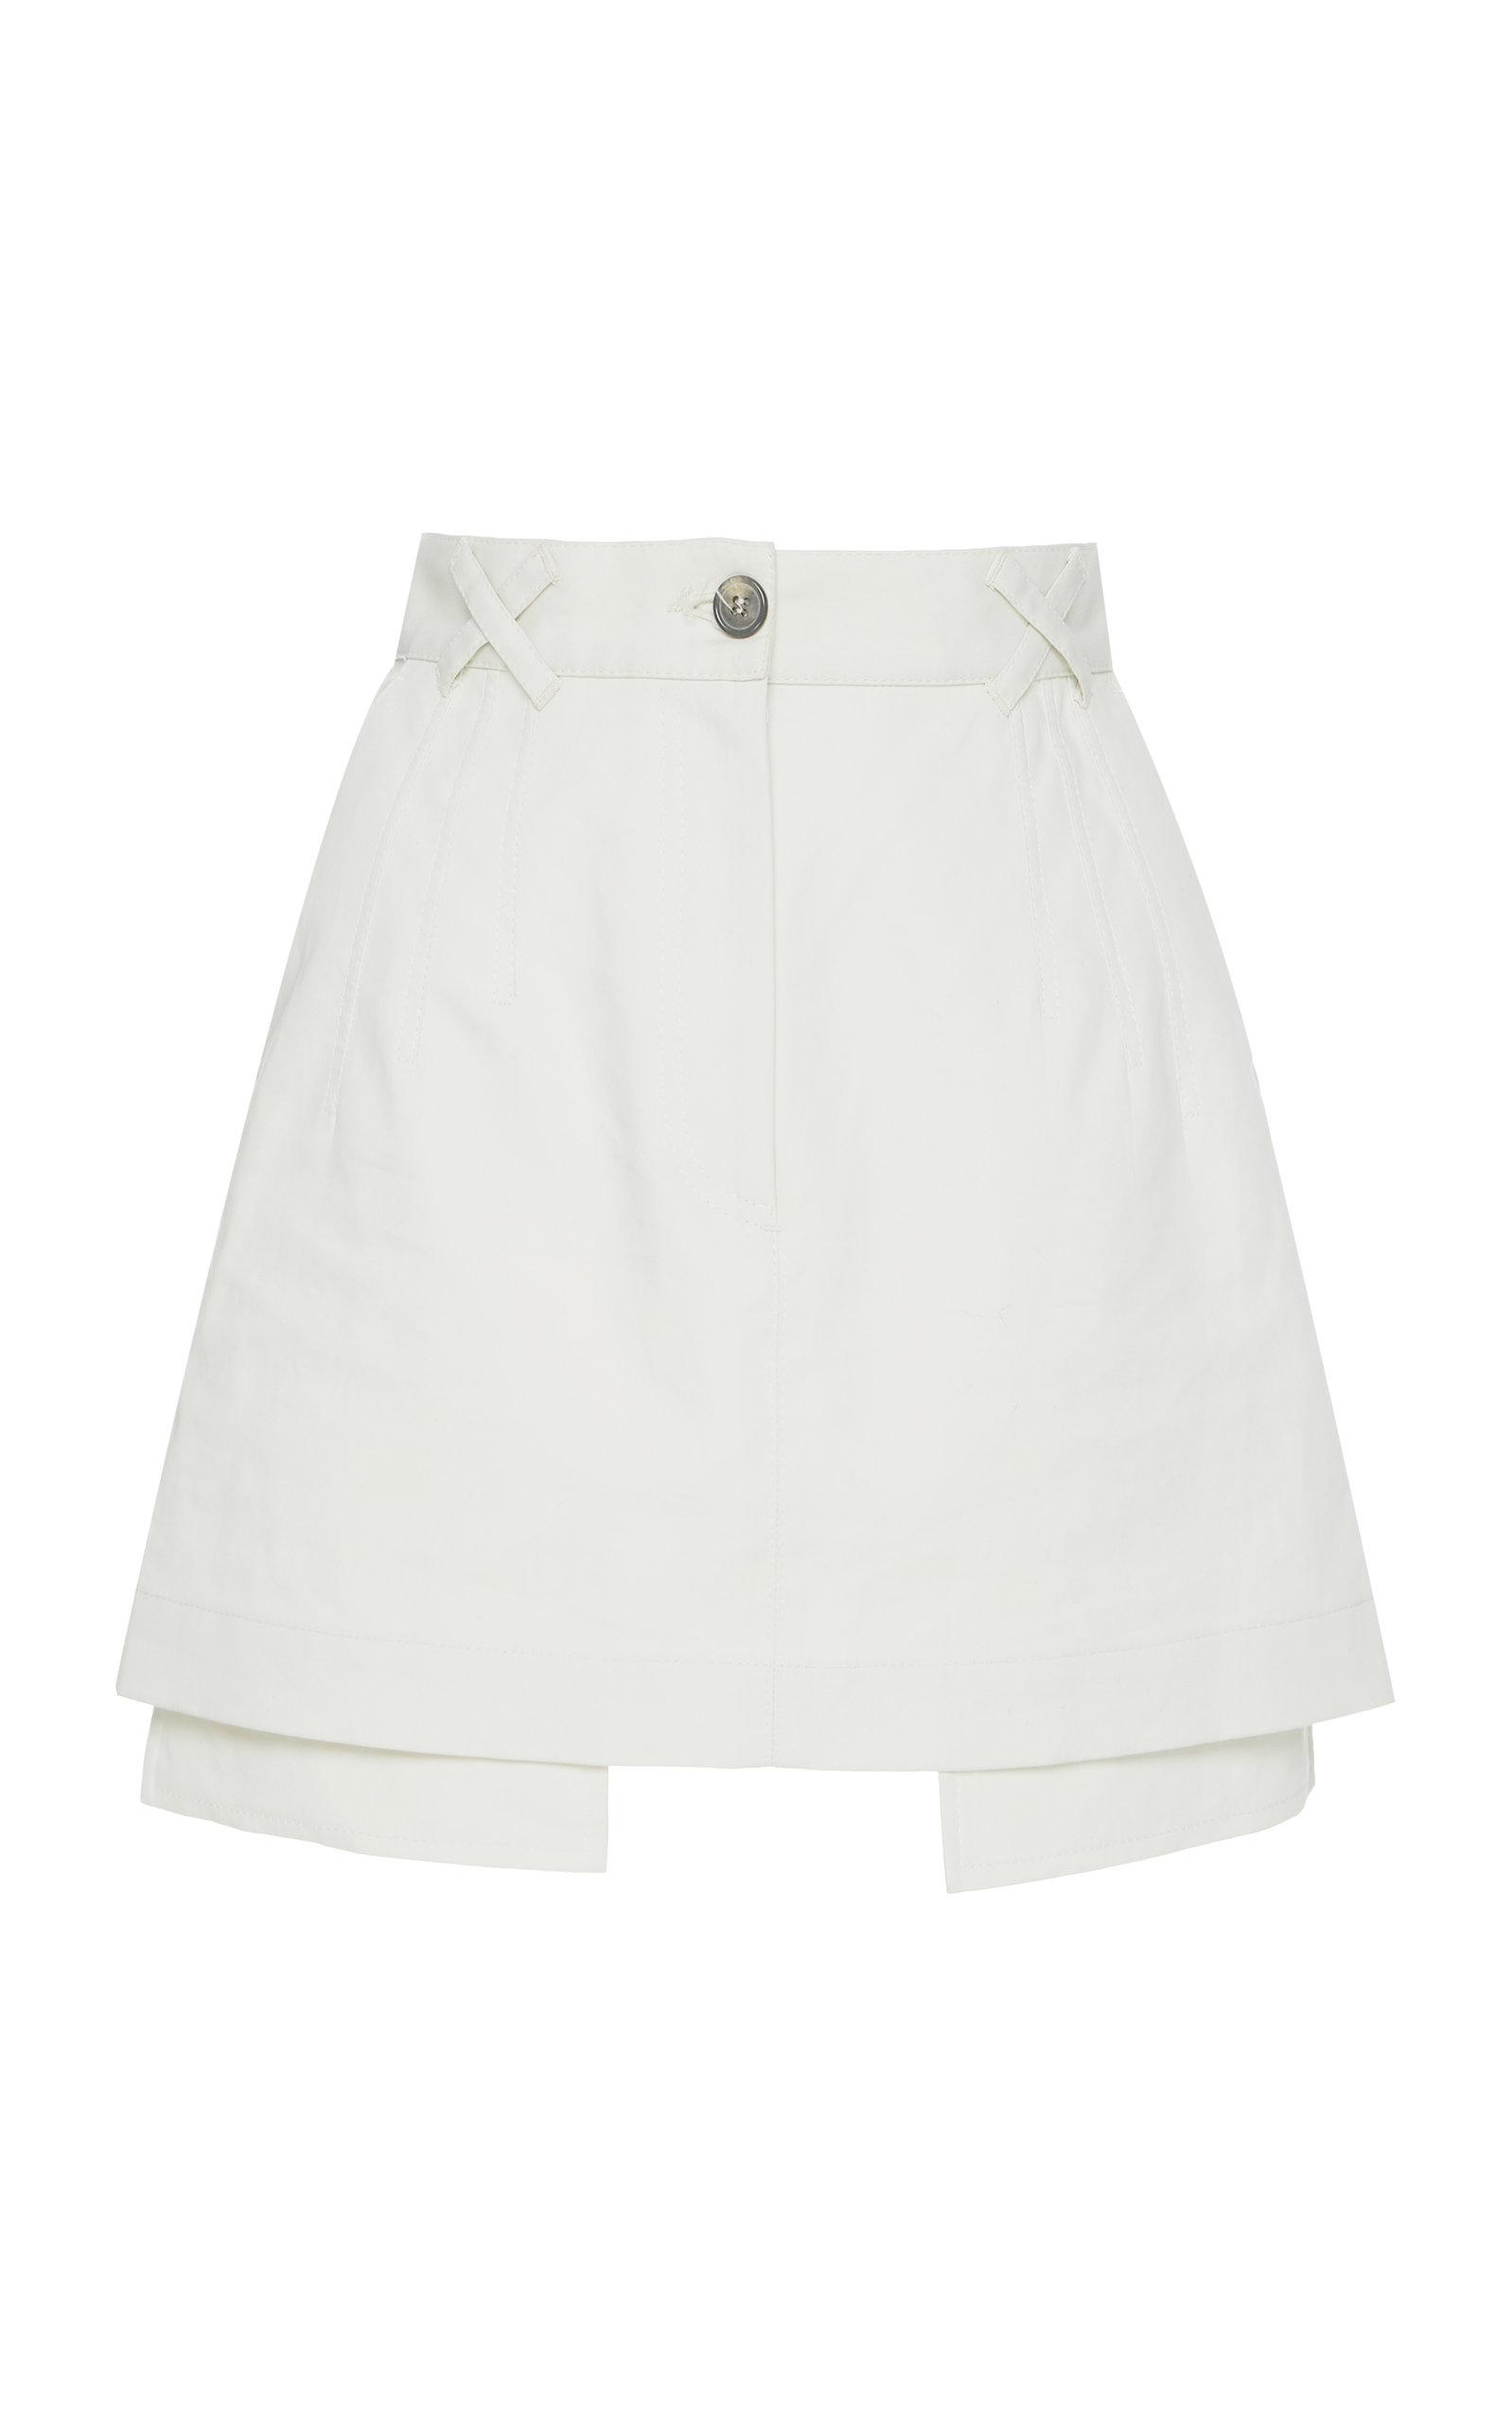 OFF-WHITE | Off-White C/O Virgil Abloh Cotton Mini Skirt | Goxip